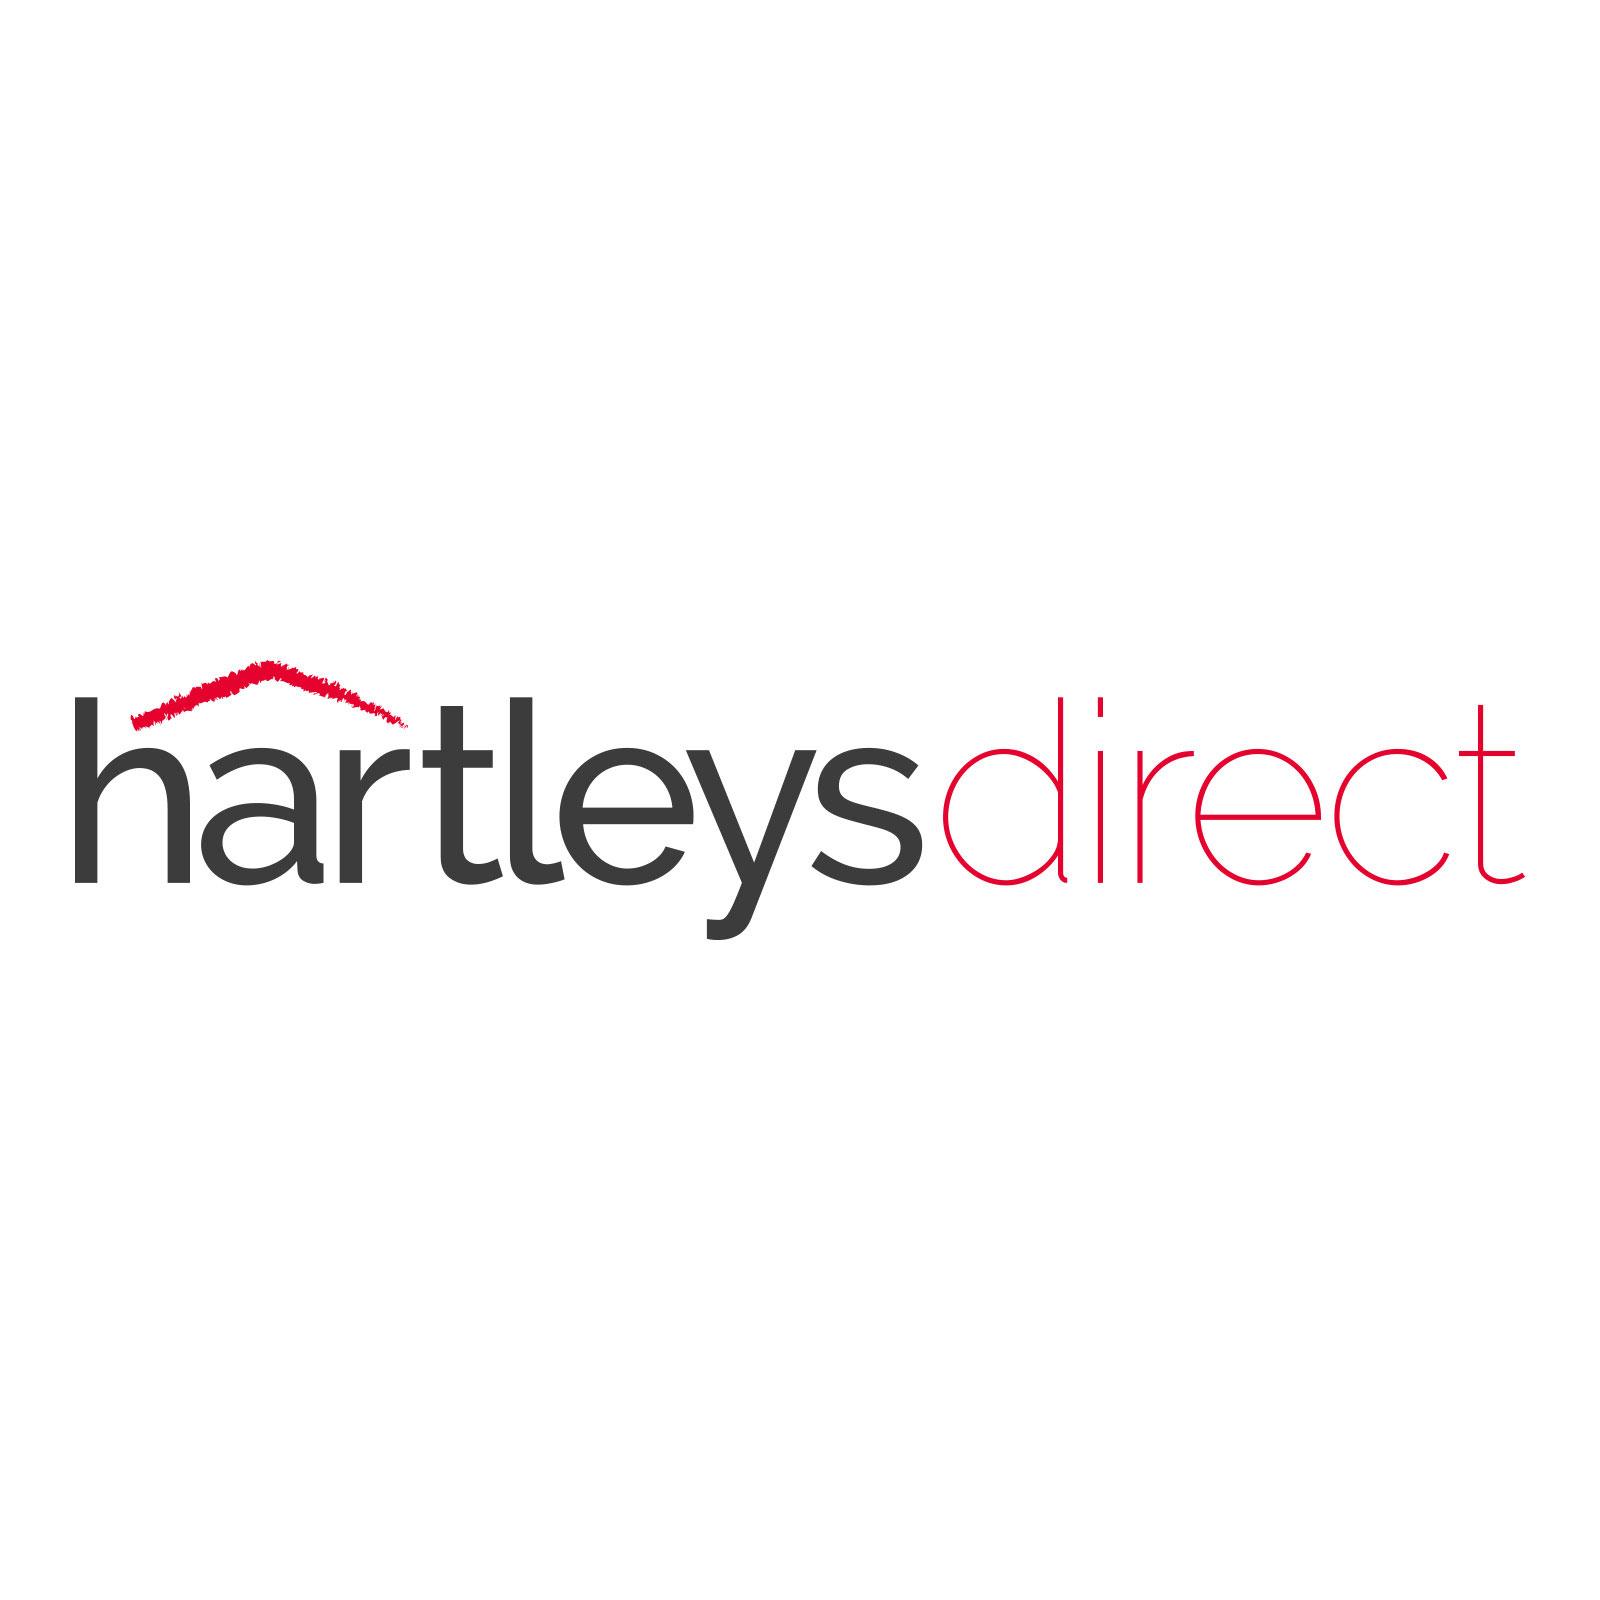 Hartleys-Grey-Round-Wicker-Serving-Tray-on-a-White-Background.jpg